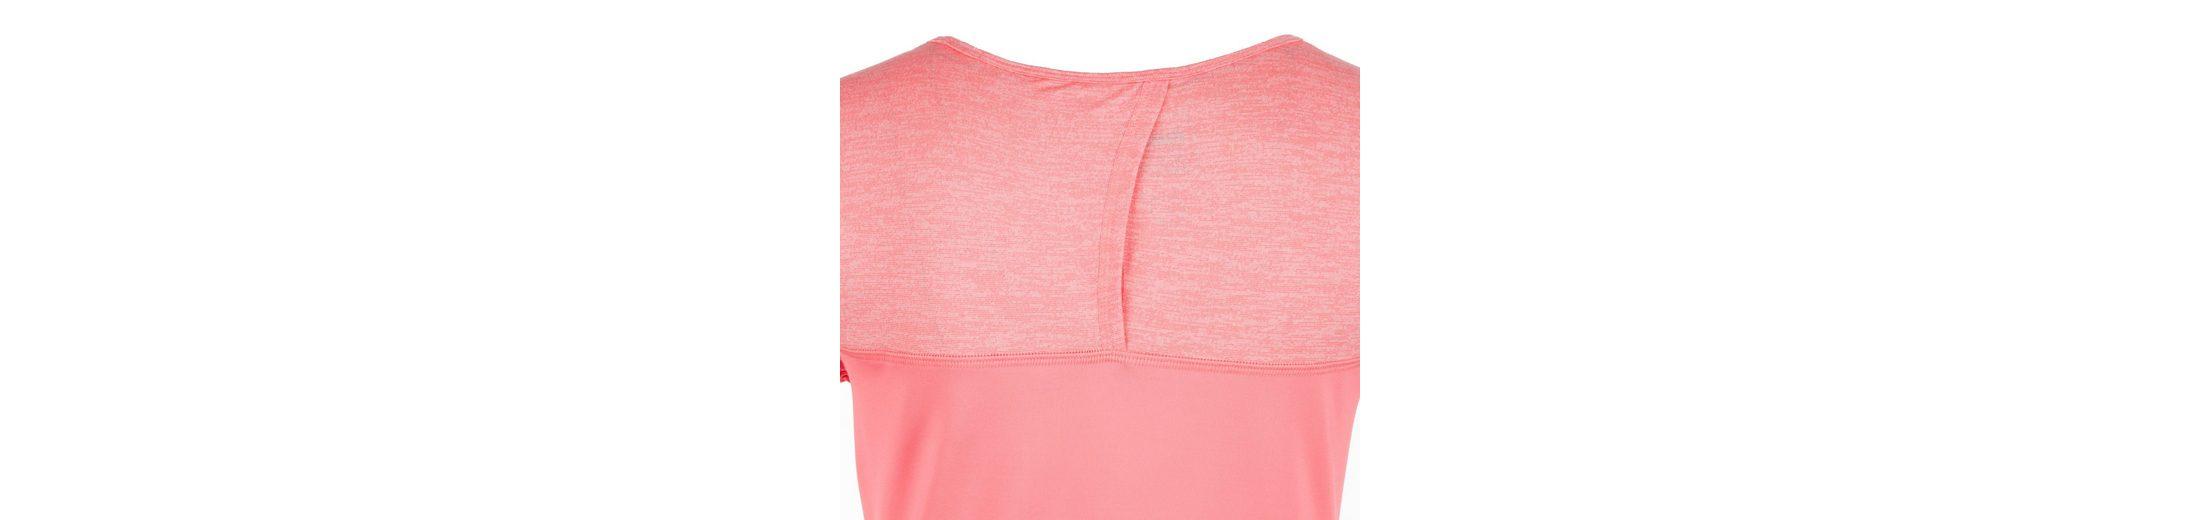 PUMA Trainingsshirt Layer Sneakernews Online WcBLIu